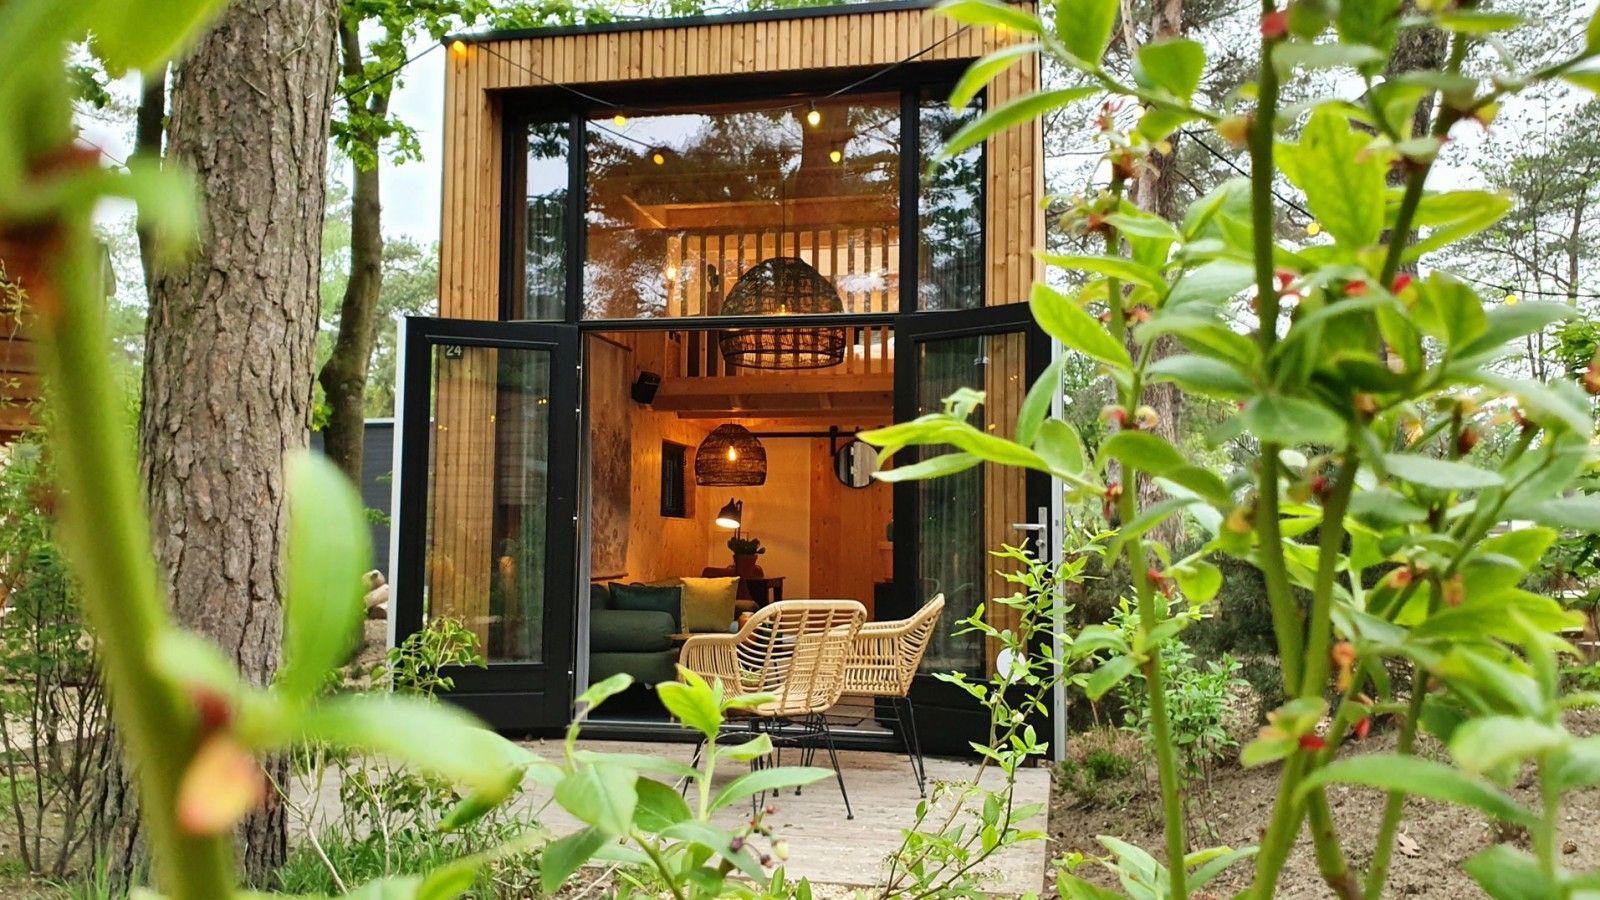 tine house droomparken - tiny house spaarnwoude - tine houses in de natuur - tine house boeken